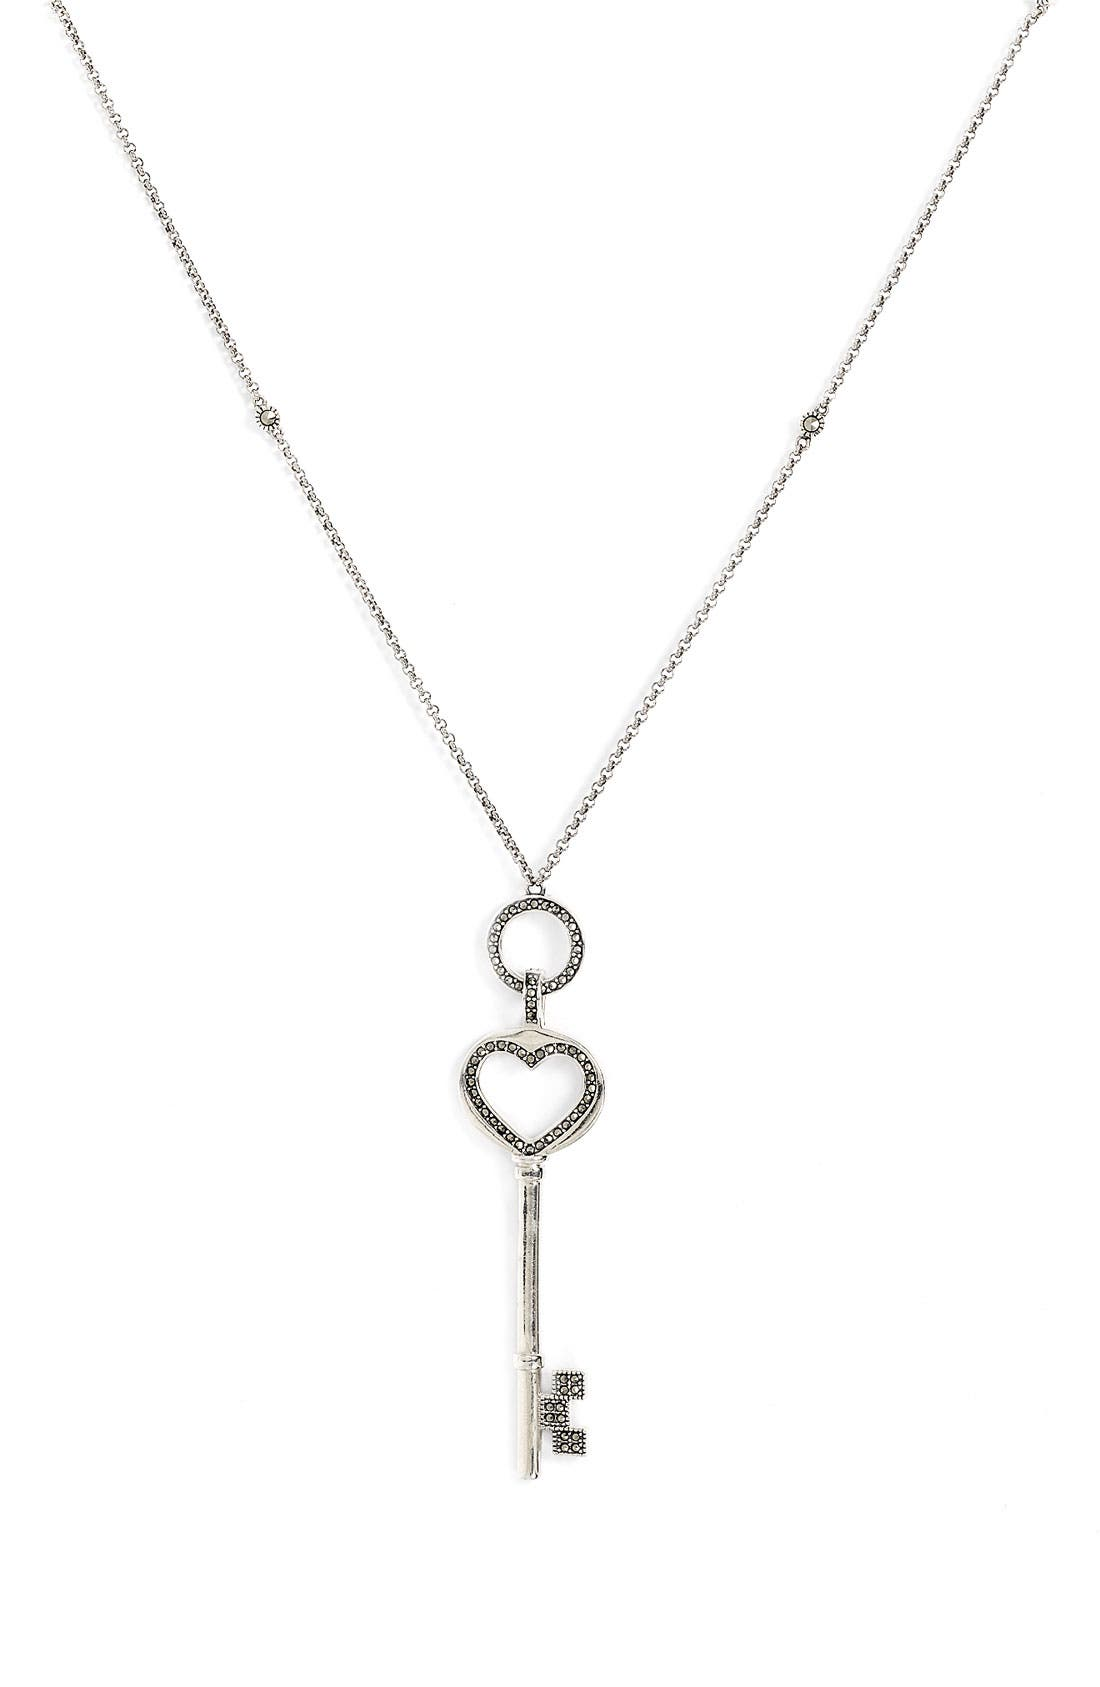 Alternate Image 1 Selected - Judith Jack Key Convertible Necklace